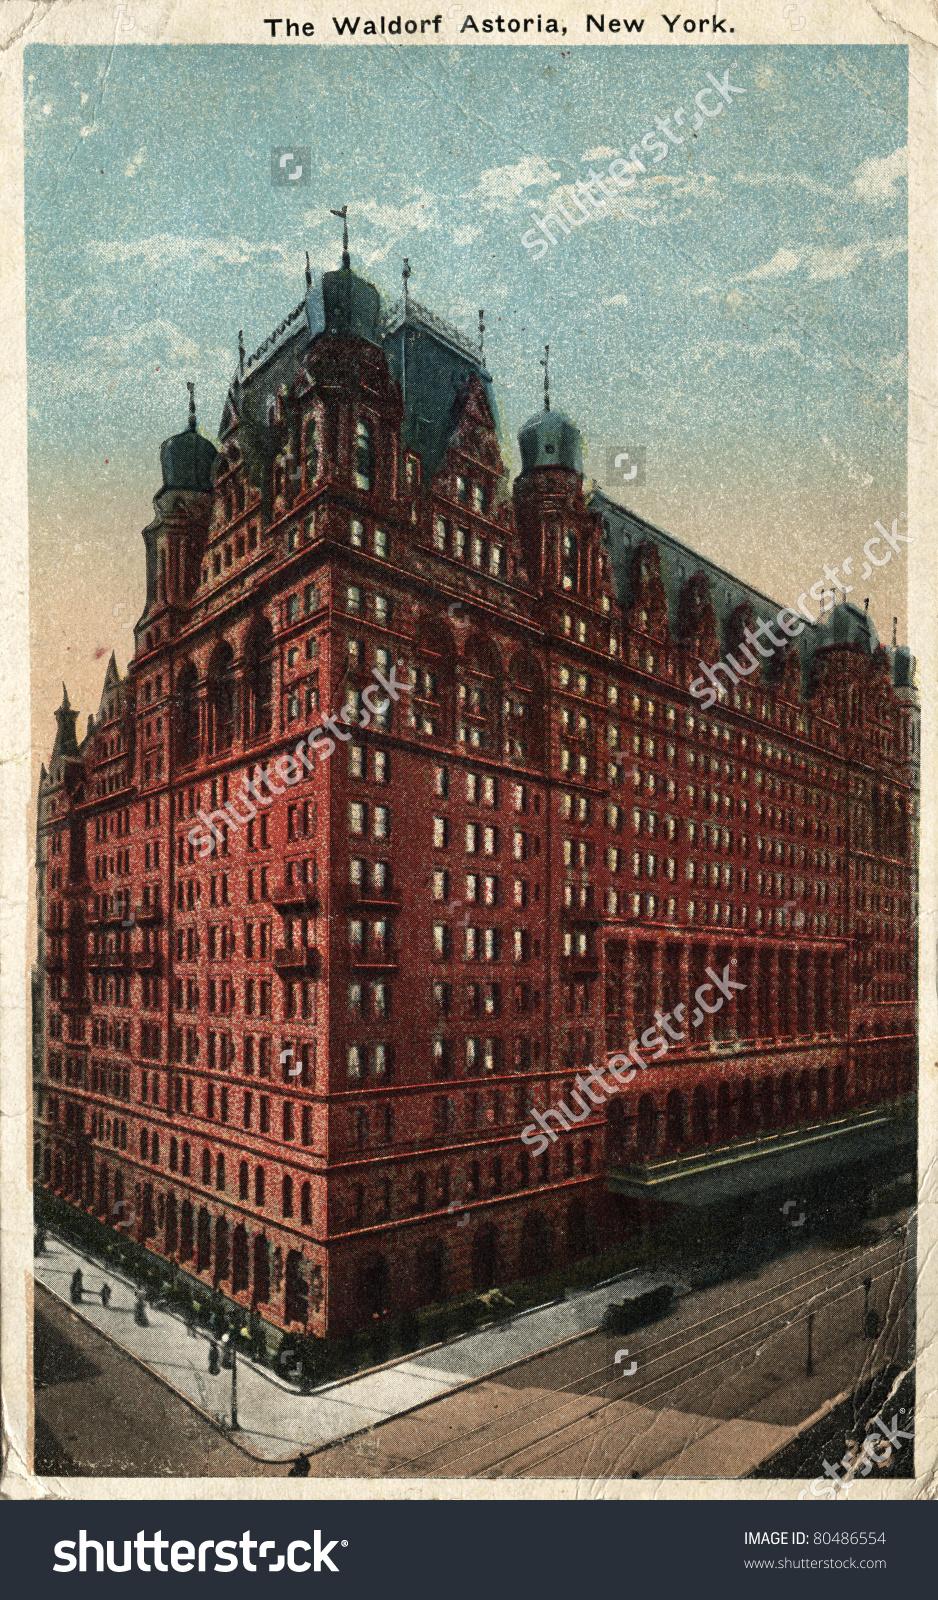 Astoria hotel clipart clipground for Waldorf astoria antiques